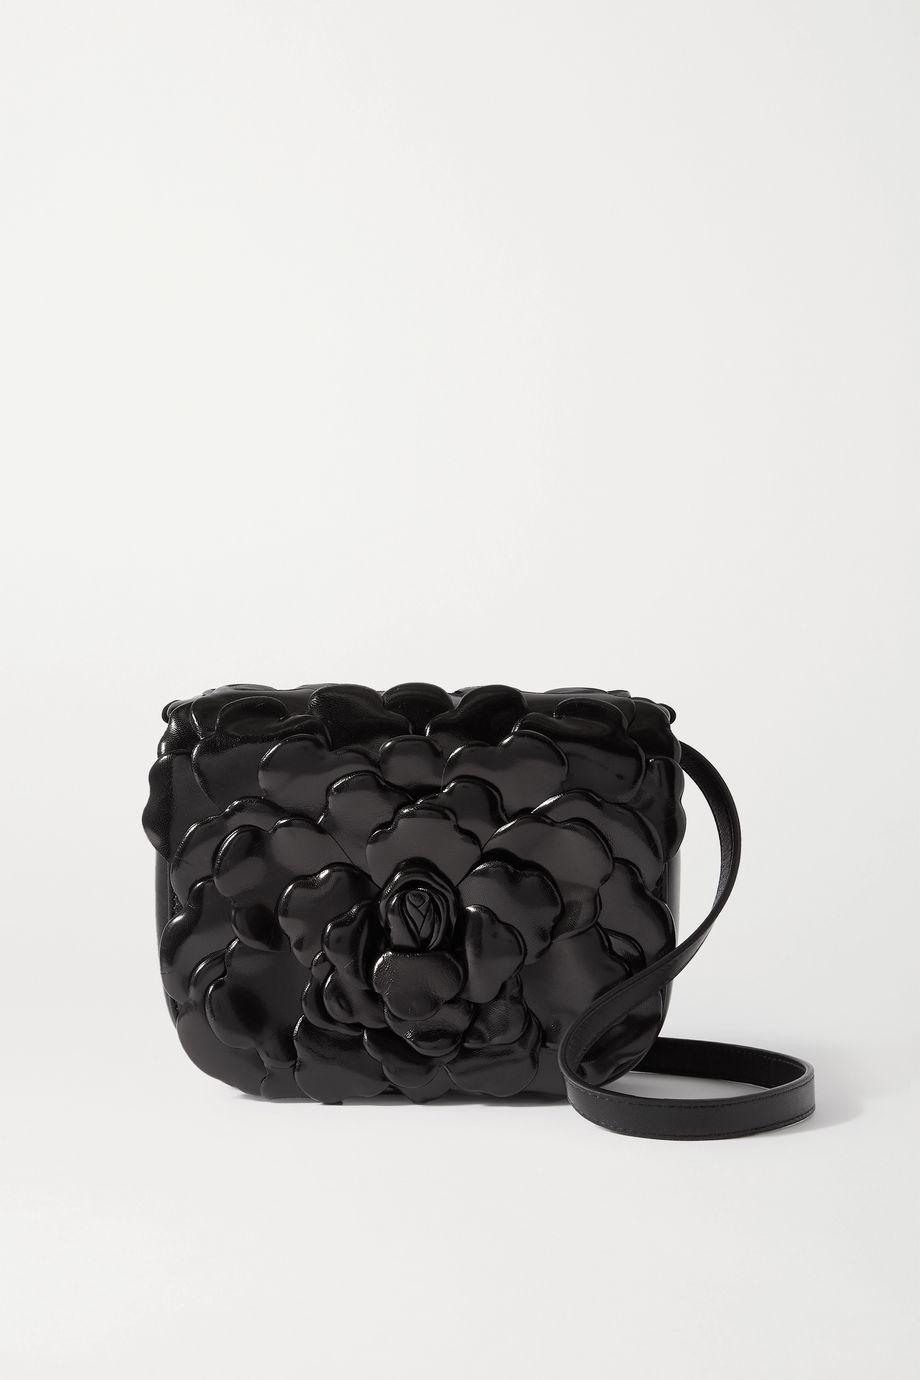 Valentino Valentino Garavani 03 Rose Edition Atelier small glossed-leather shoulder bag